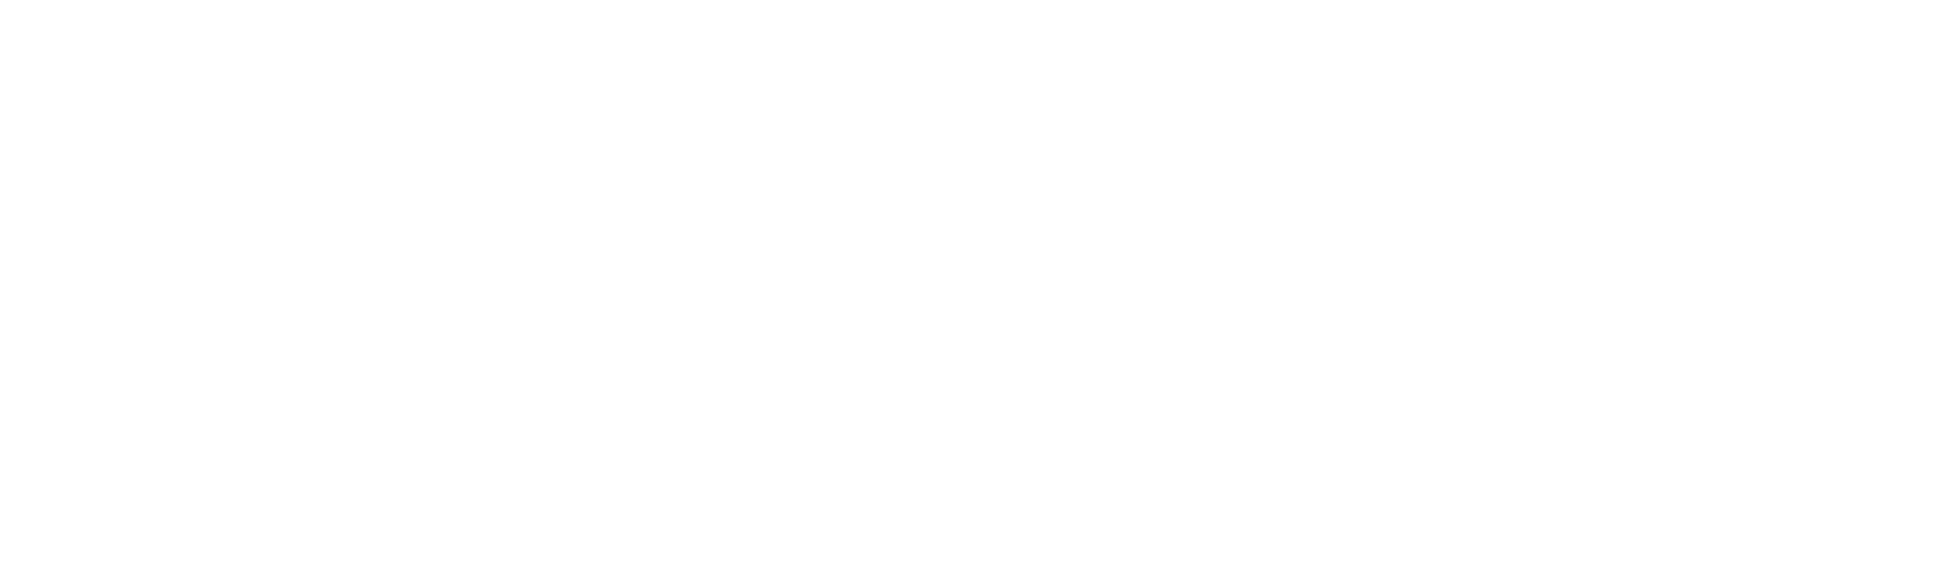 Sosogames: Wholesales | Retails | Play | Fun